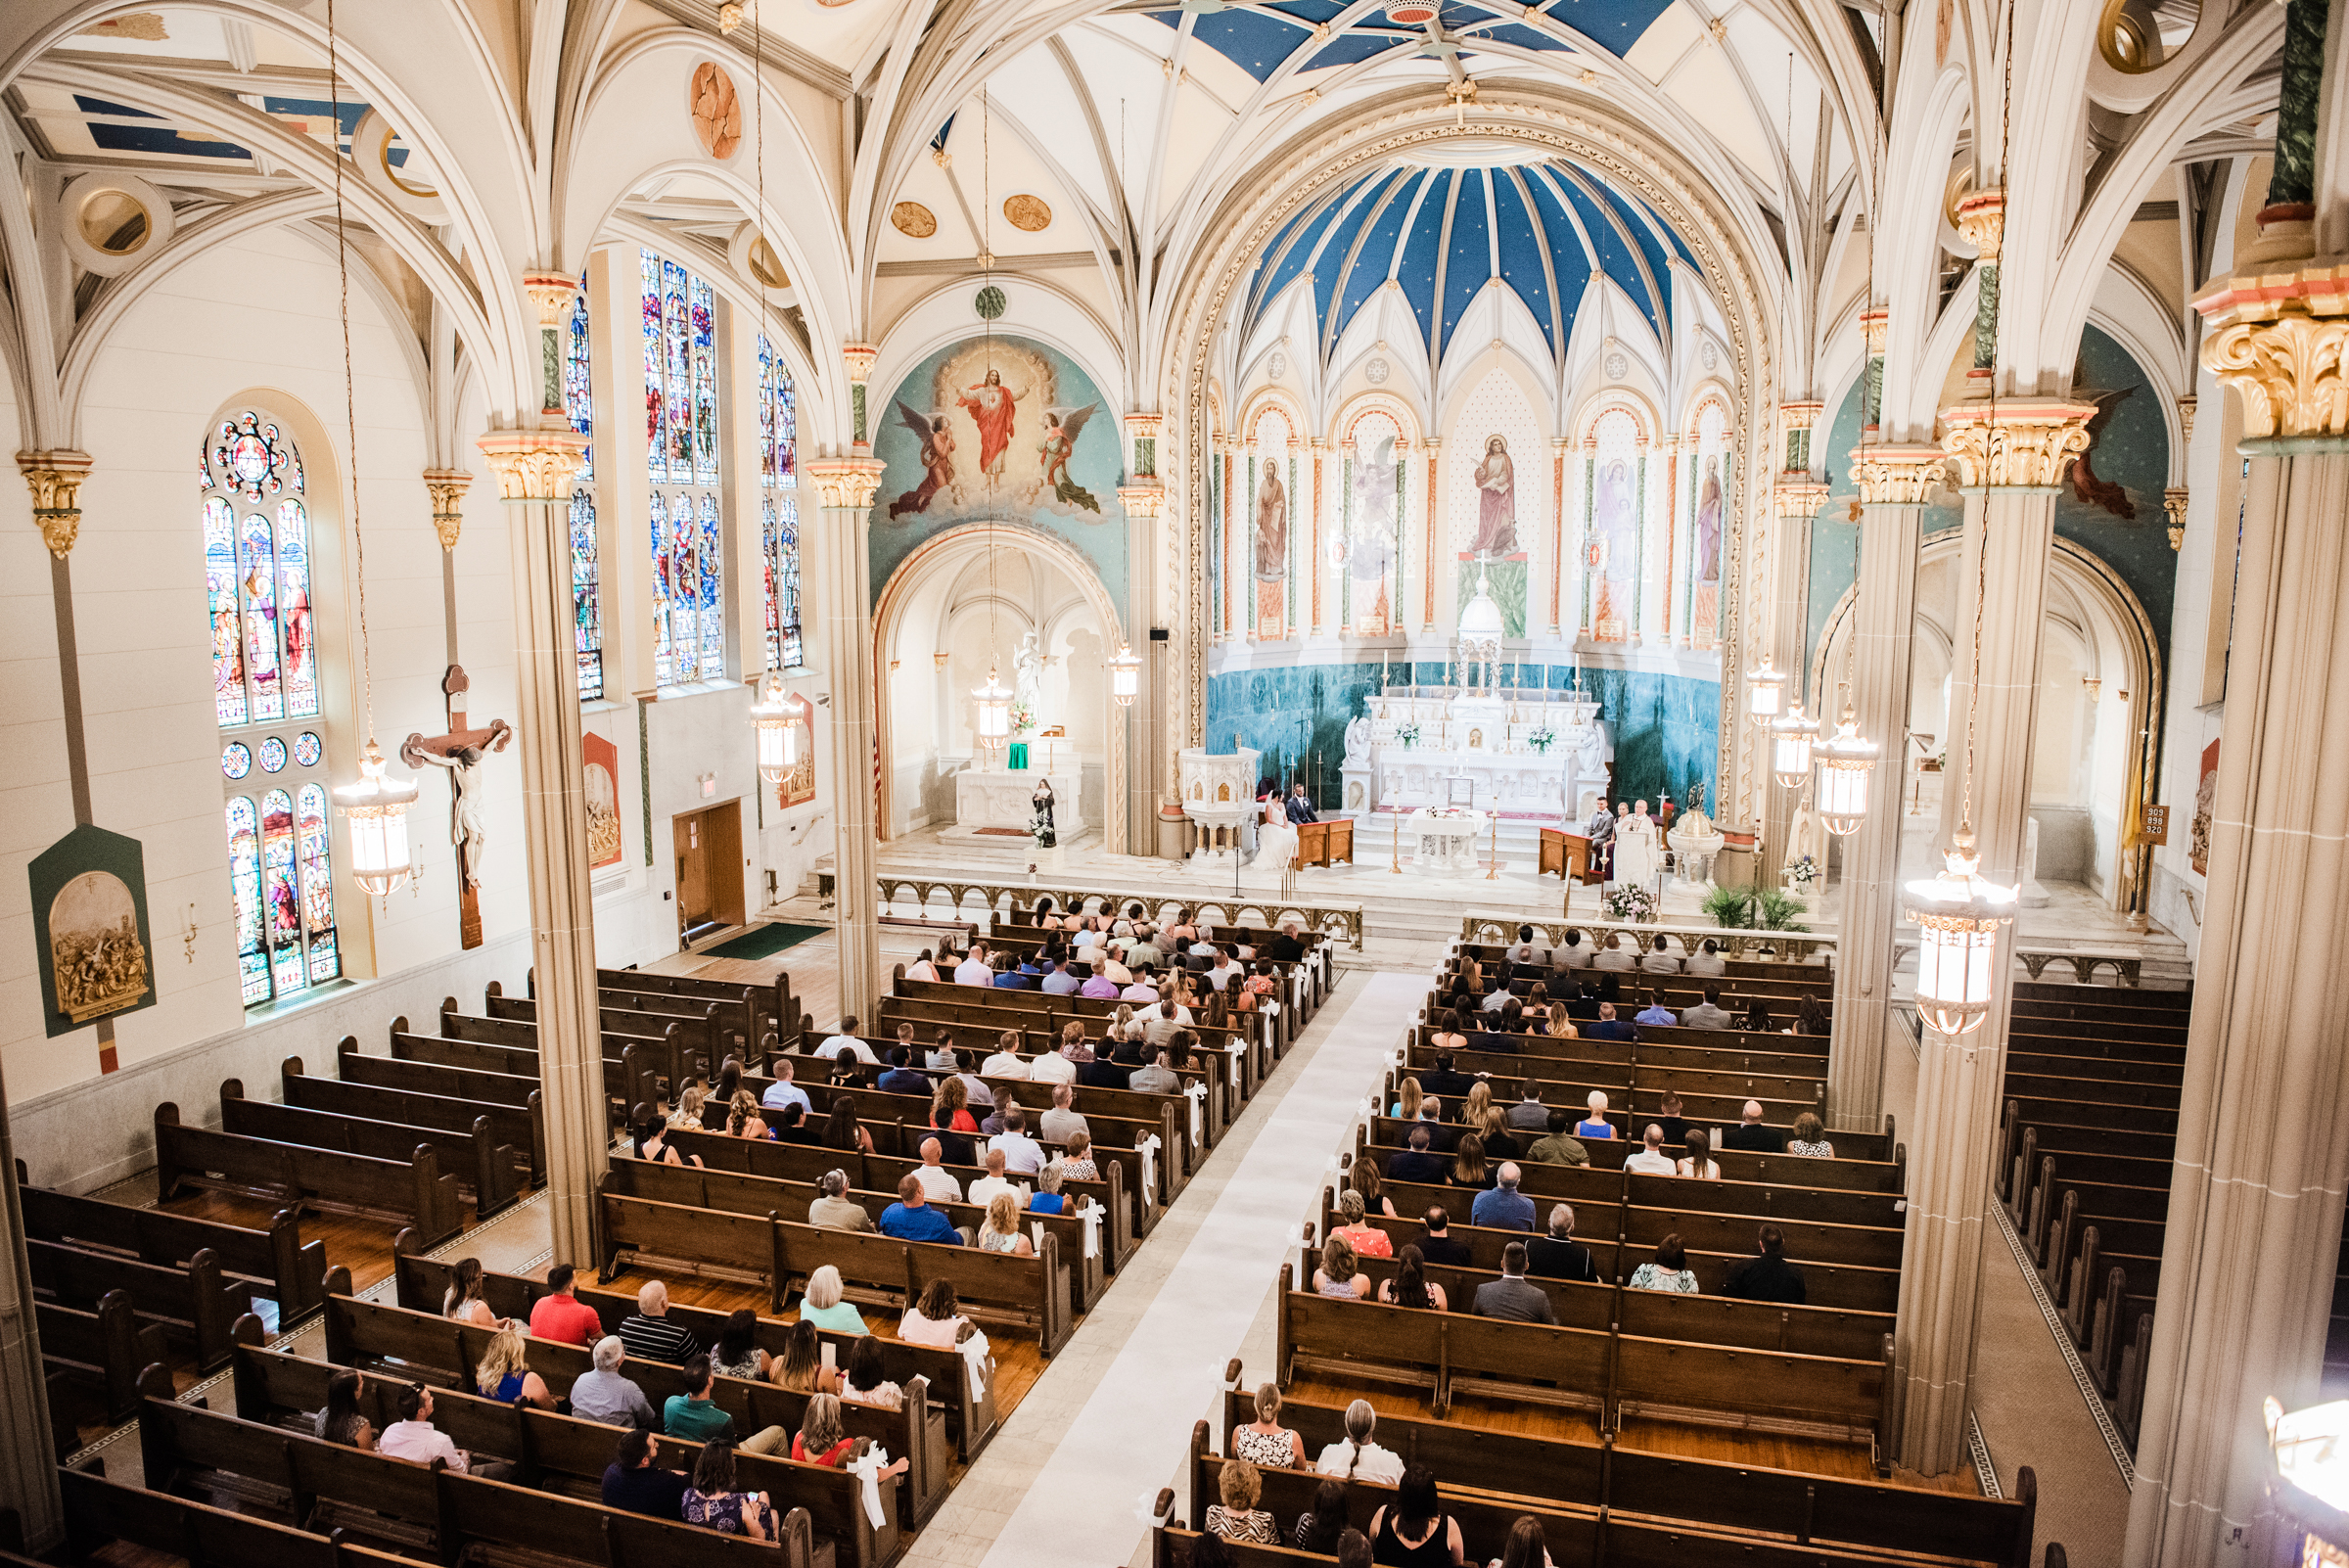 Historic_Old_St_Johns_Church_Valentinos_Banquet_Hall_Central_NY_Wedding_JILL_STUDIO_Rochester_NY_Photographer_DSC_5750.jpg